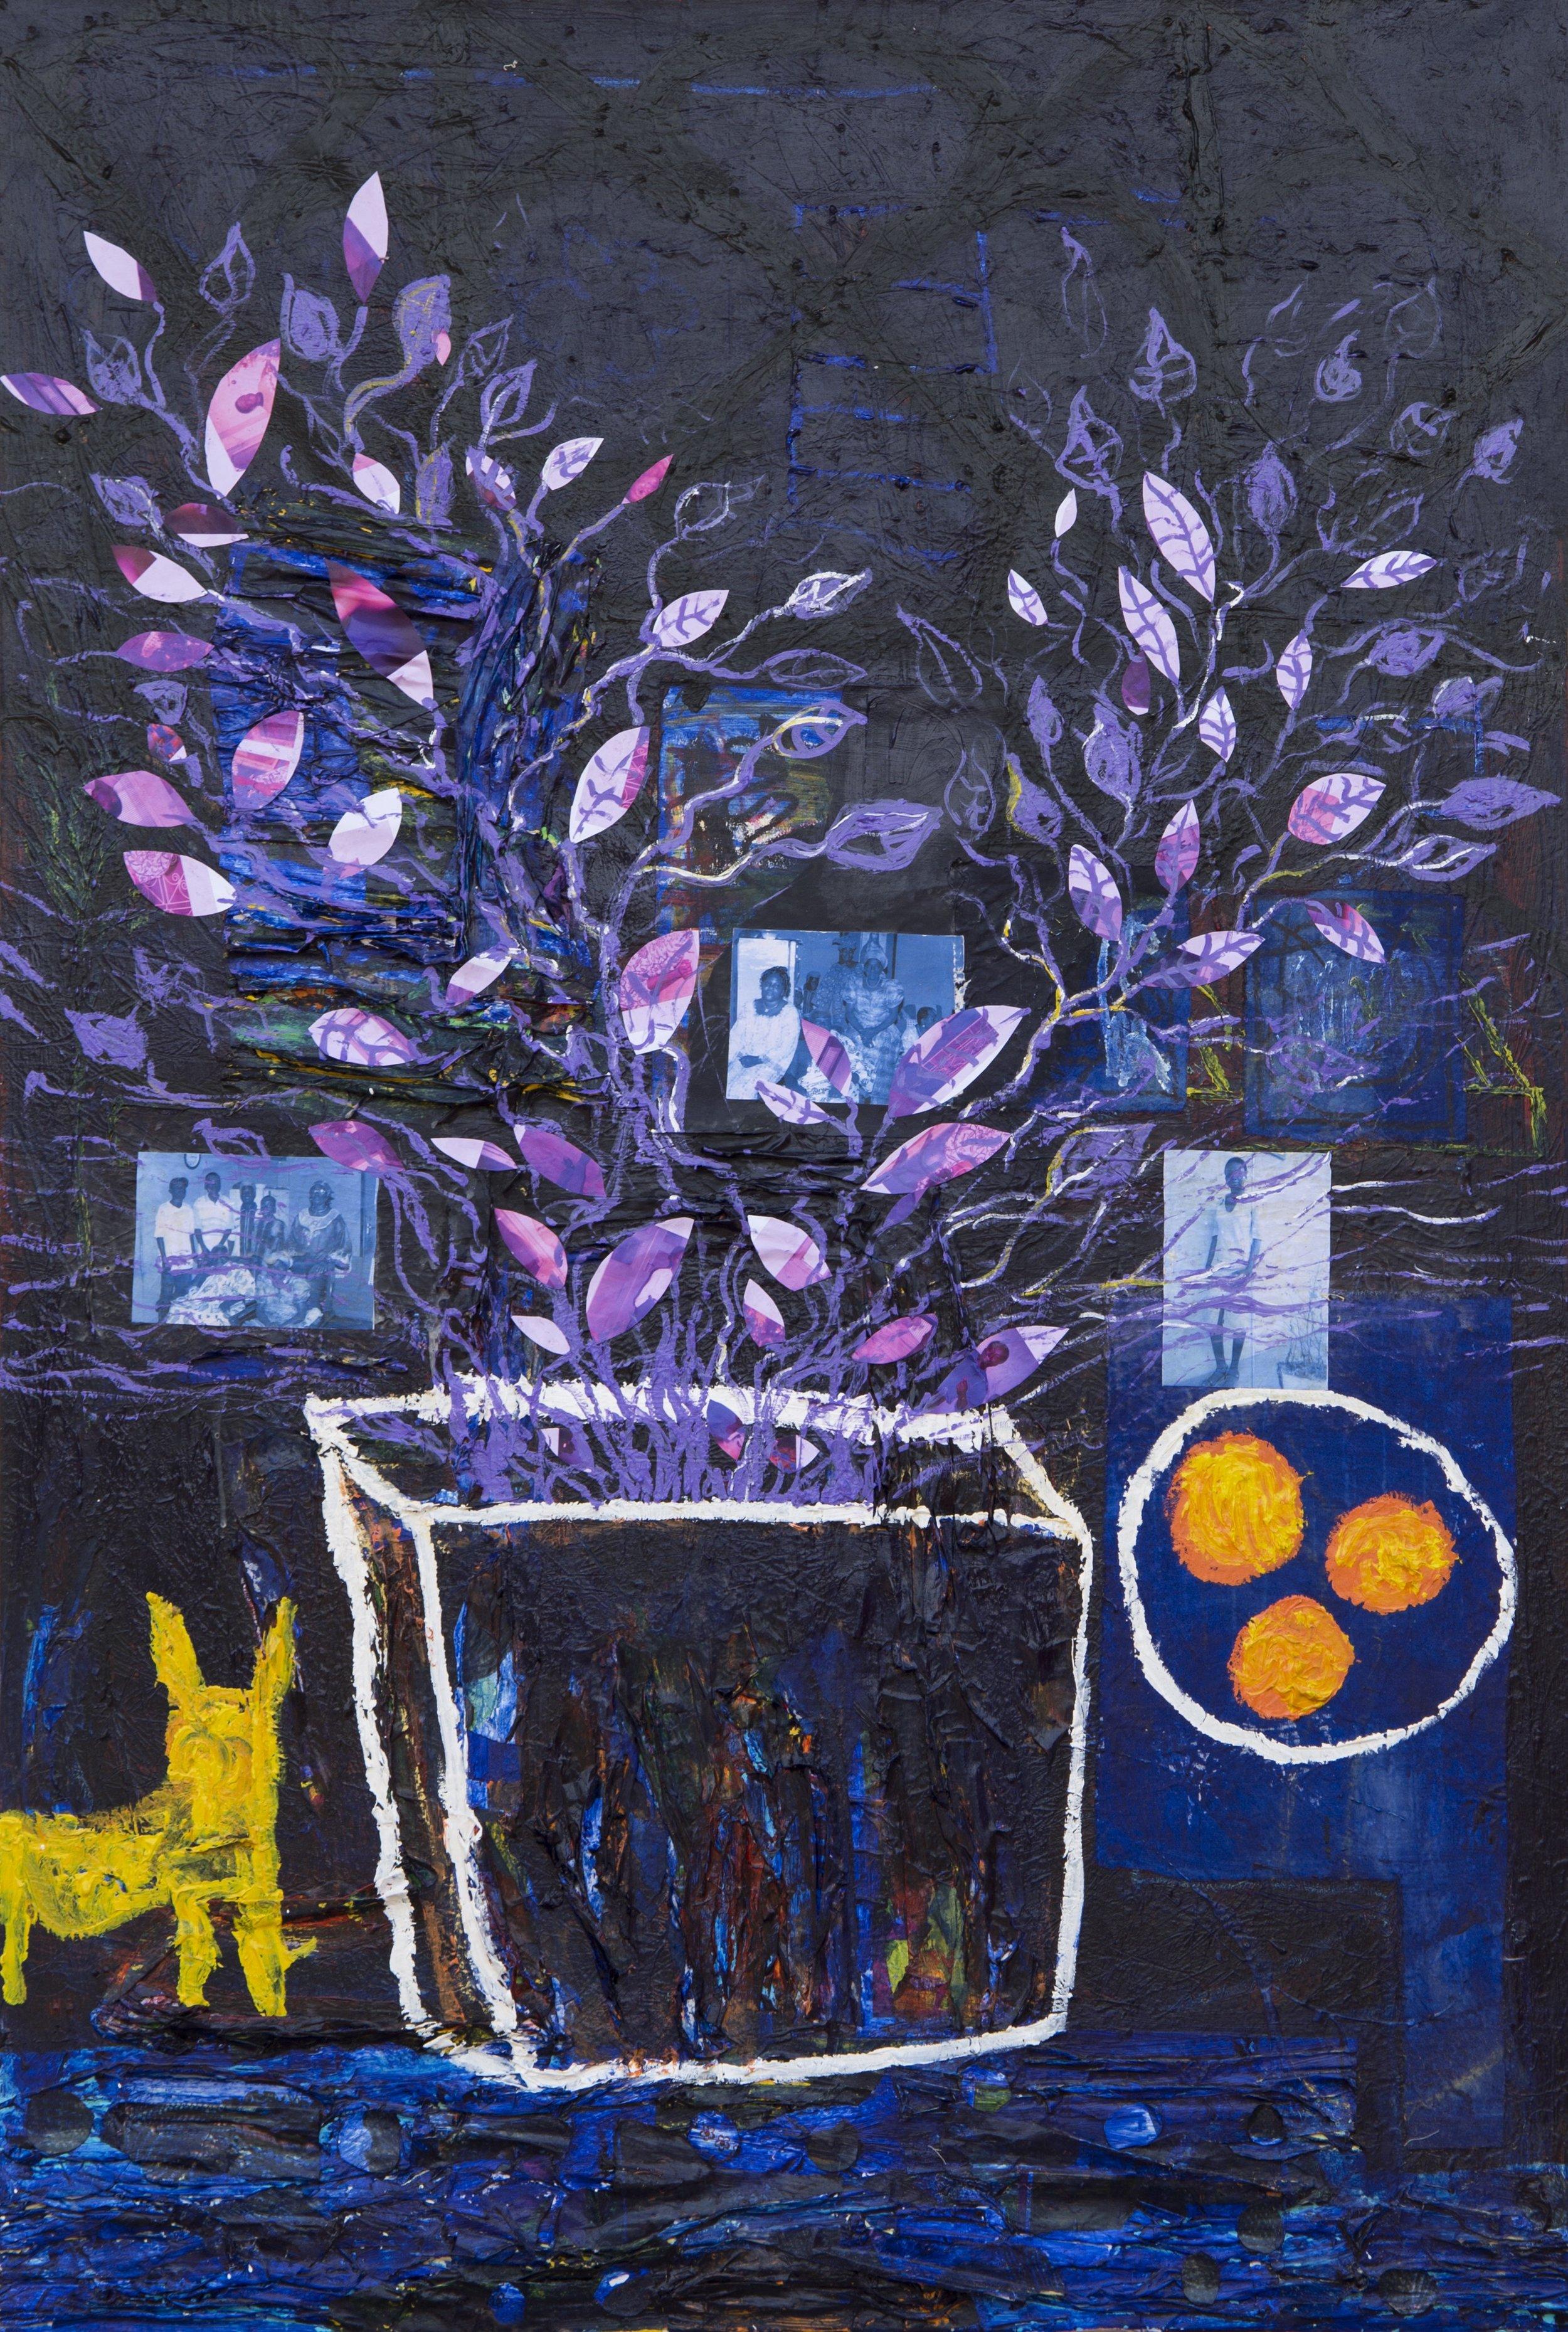 Akutu dua ene okra a oda gyam (Orange, Tree, and Cat on Fire ), 2017, mixed media (acrylics, wax, photographs) on canvas, 154 cm x 102 cm